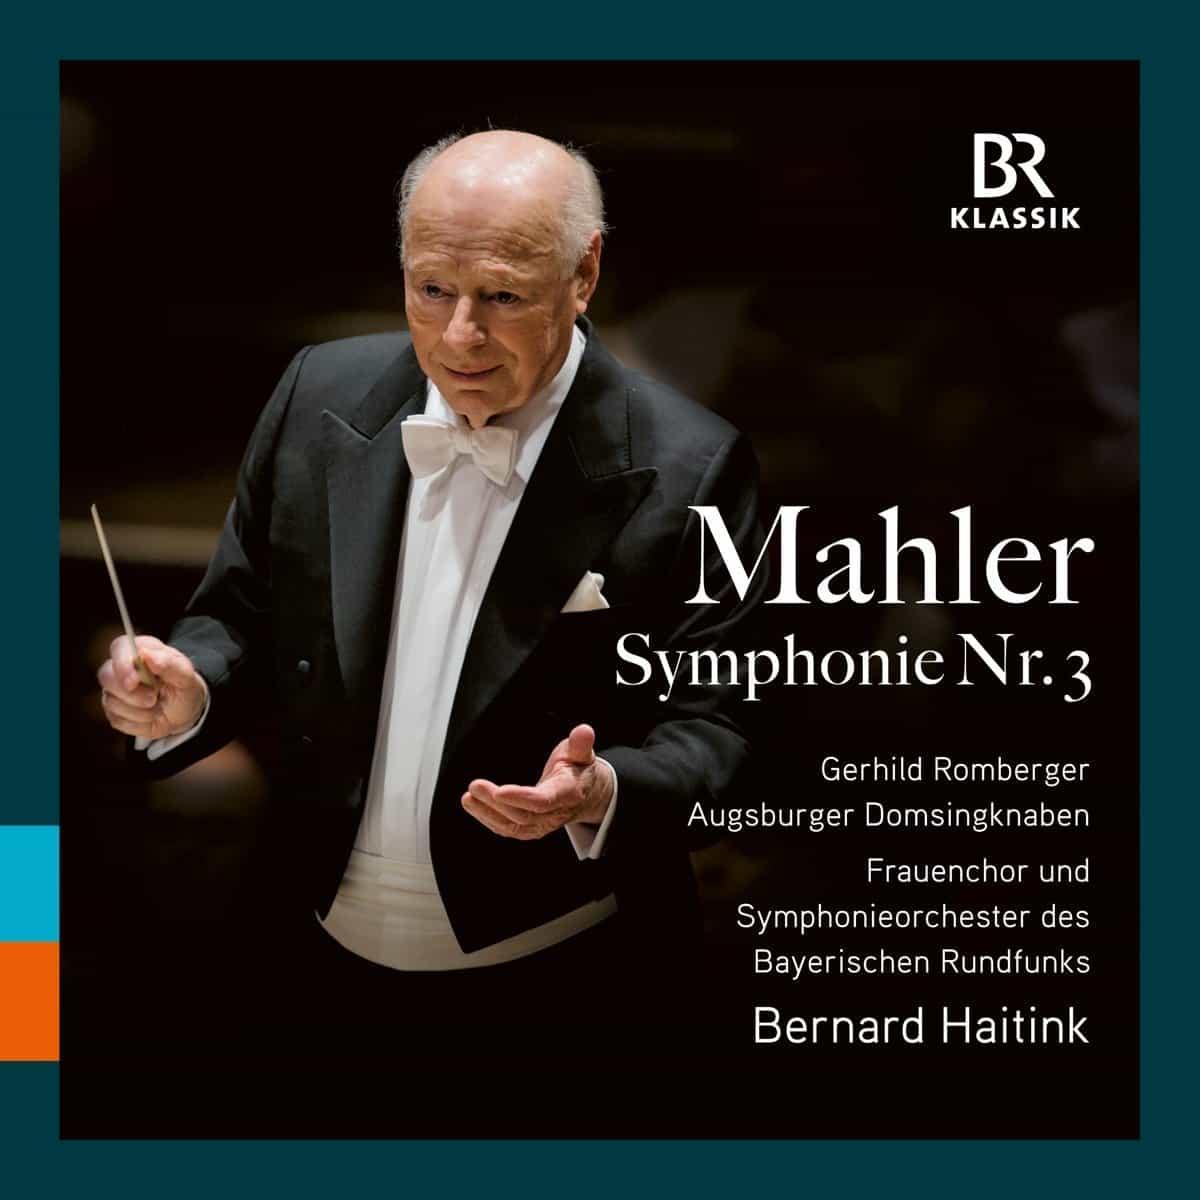 Mahler 3 Haitink Bavarian Radio Symphony Orchestra BR Klassik